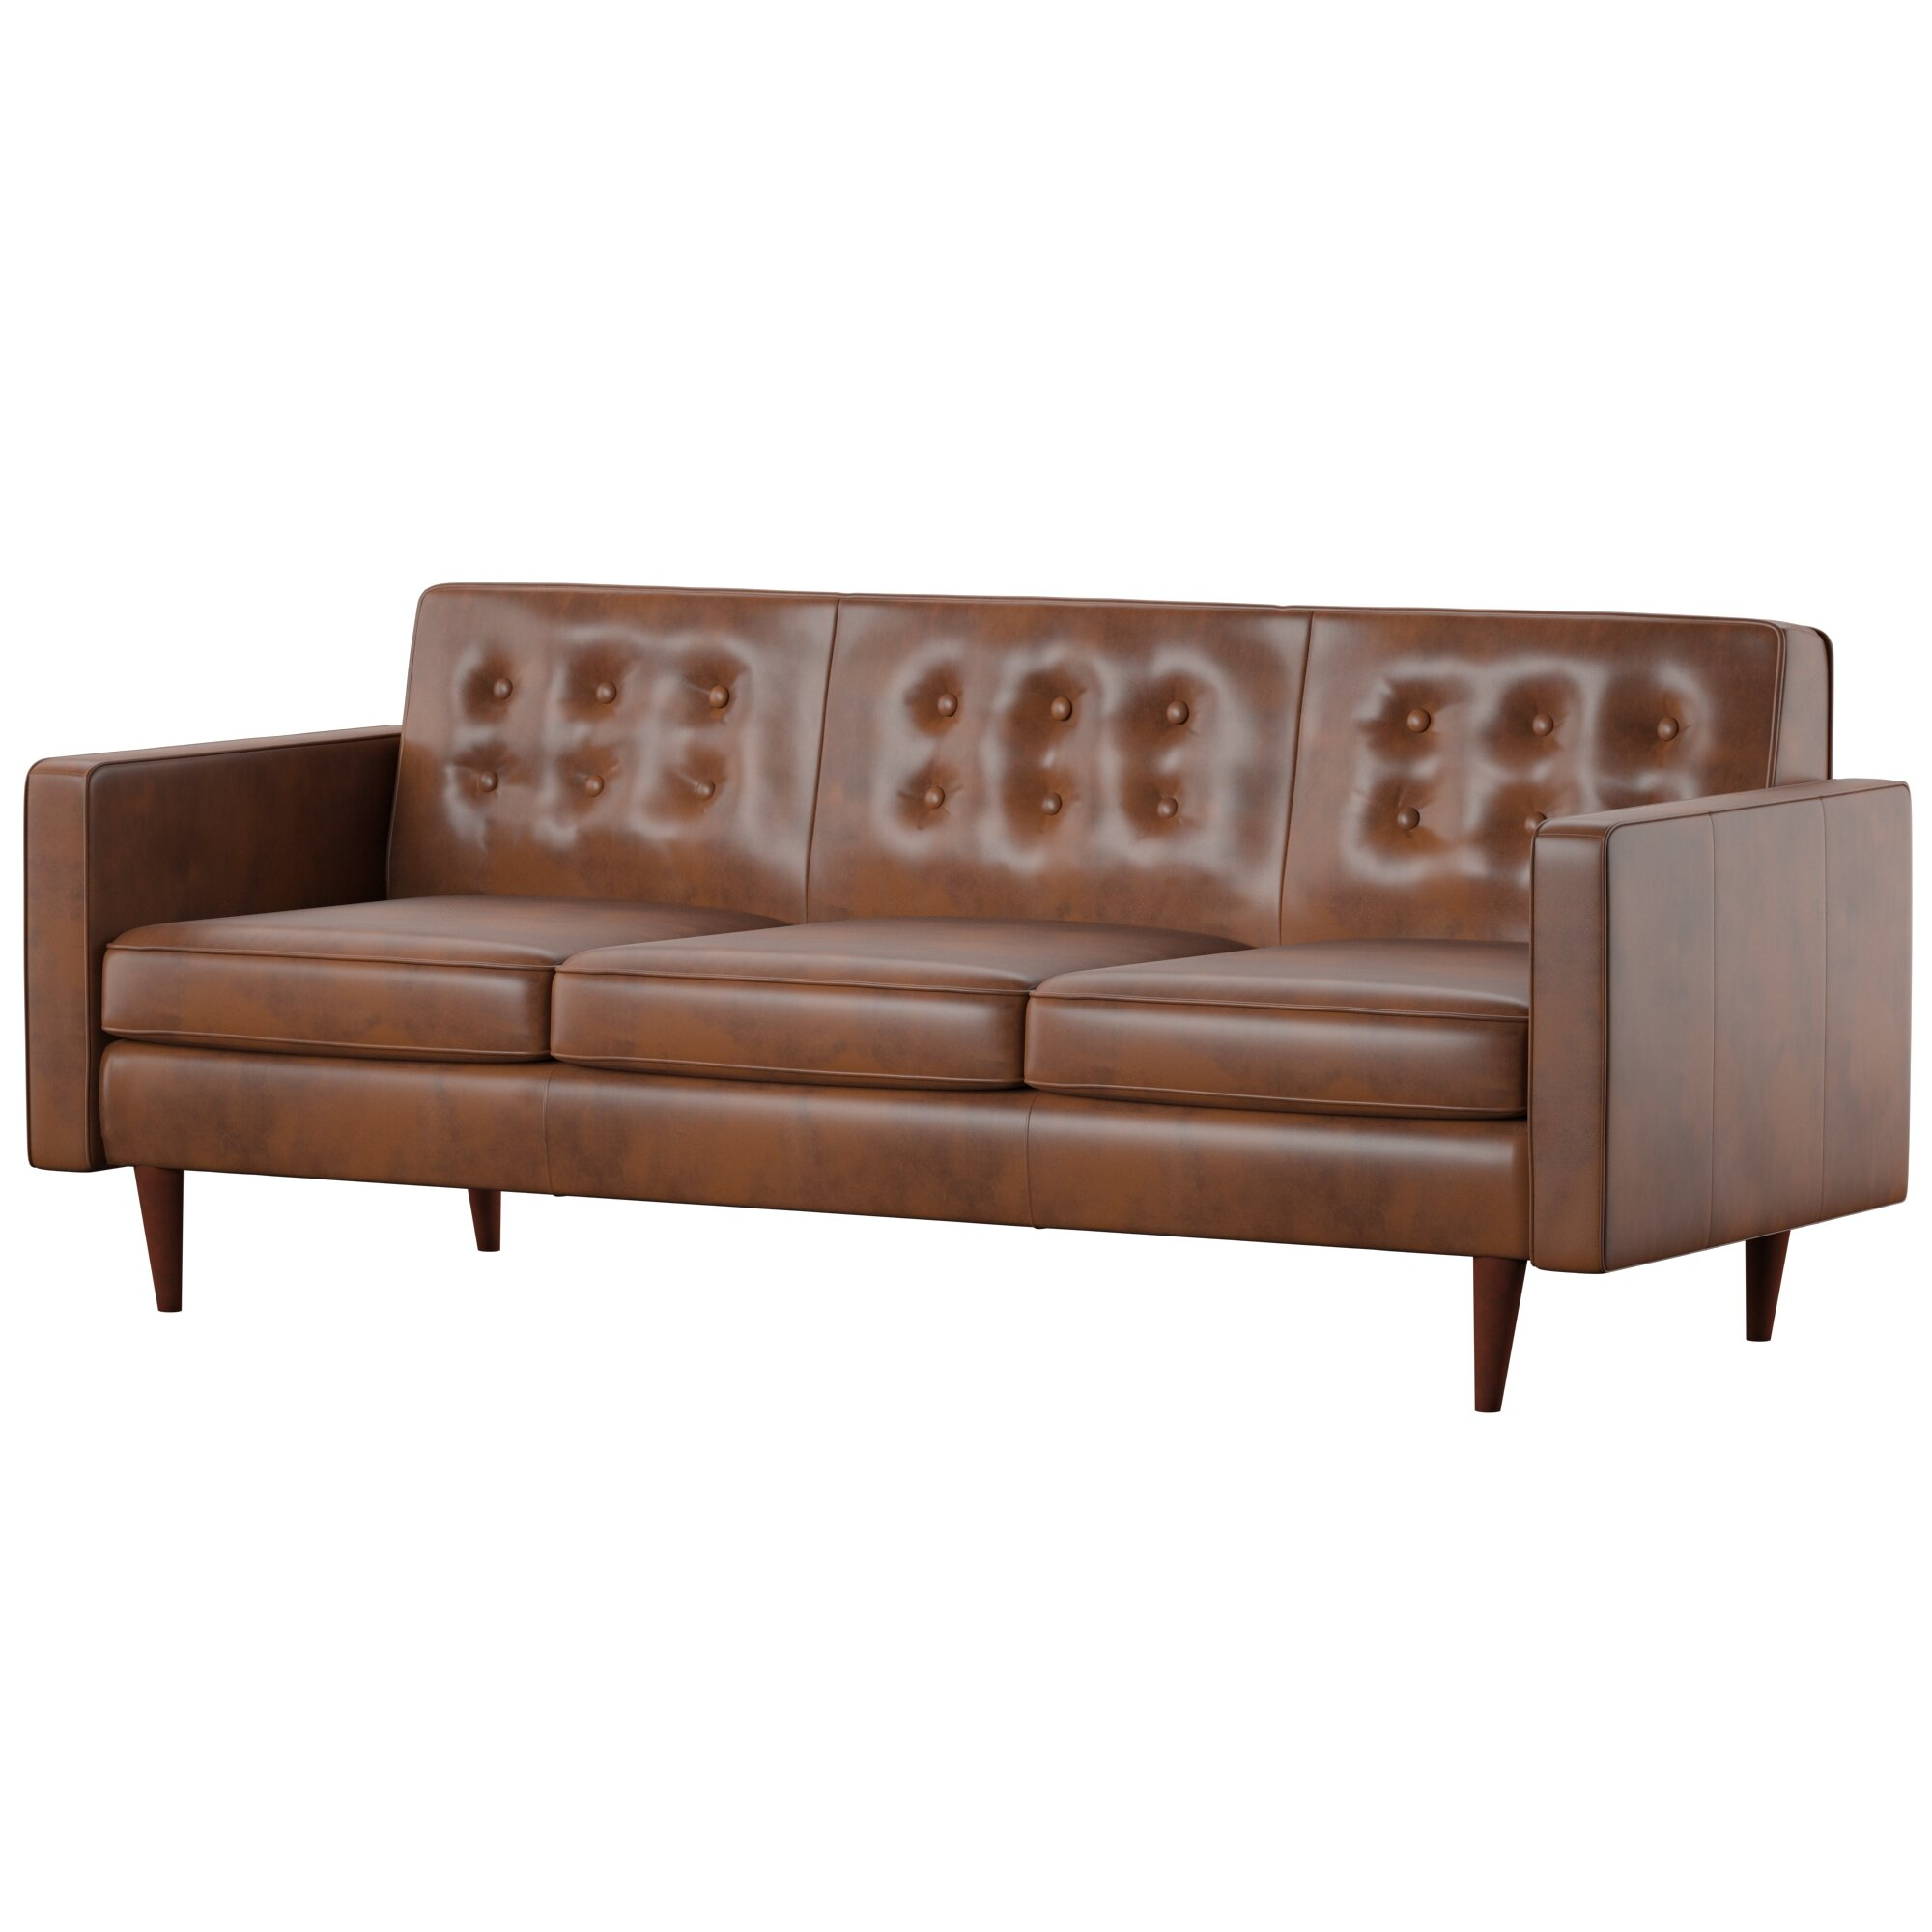 Louane Mid Century Modern Leather Sofa Reviews Allmodern